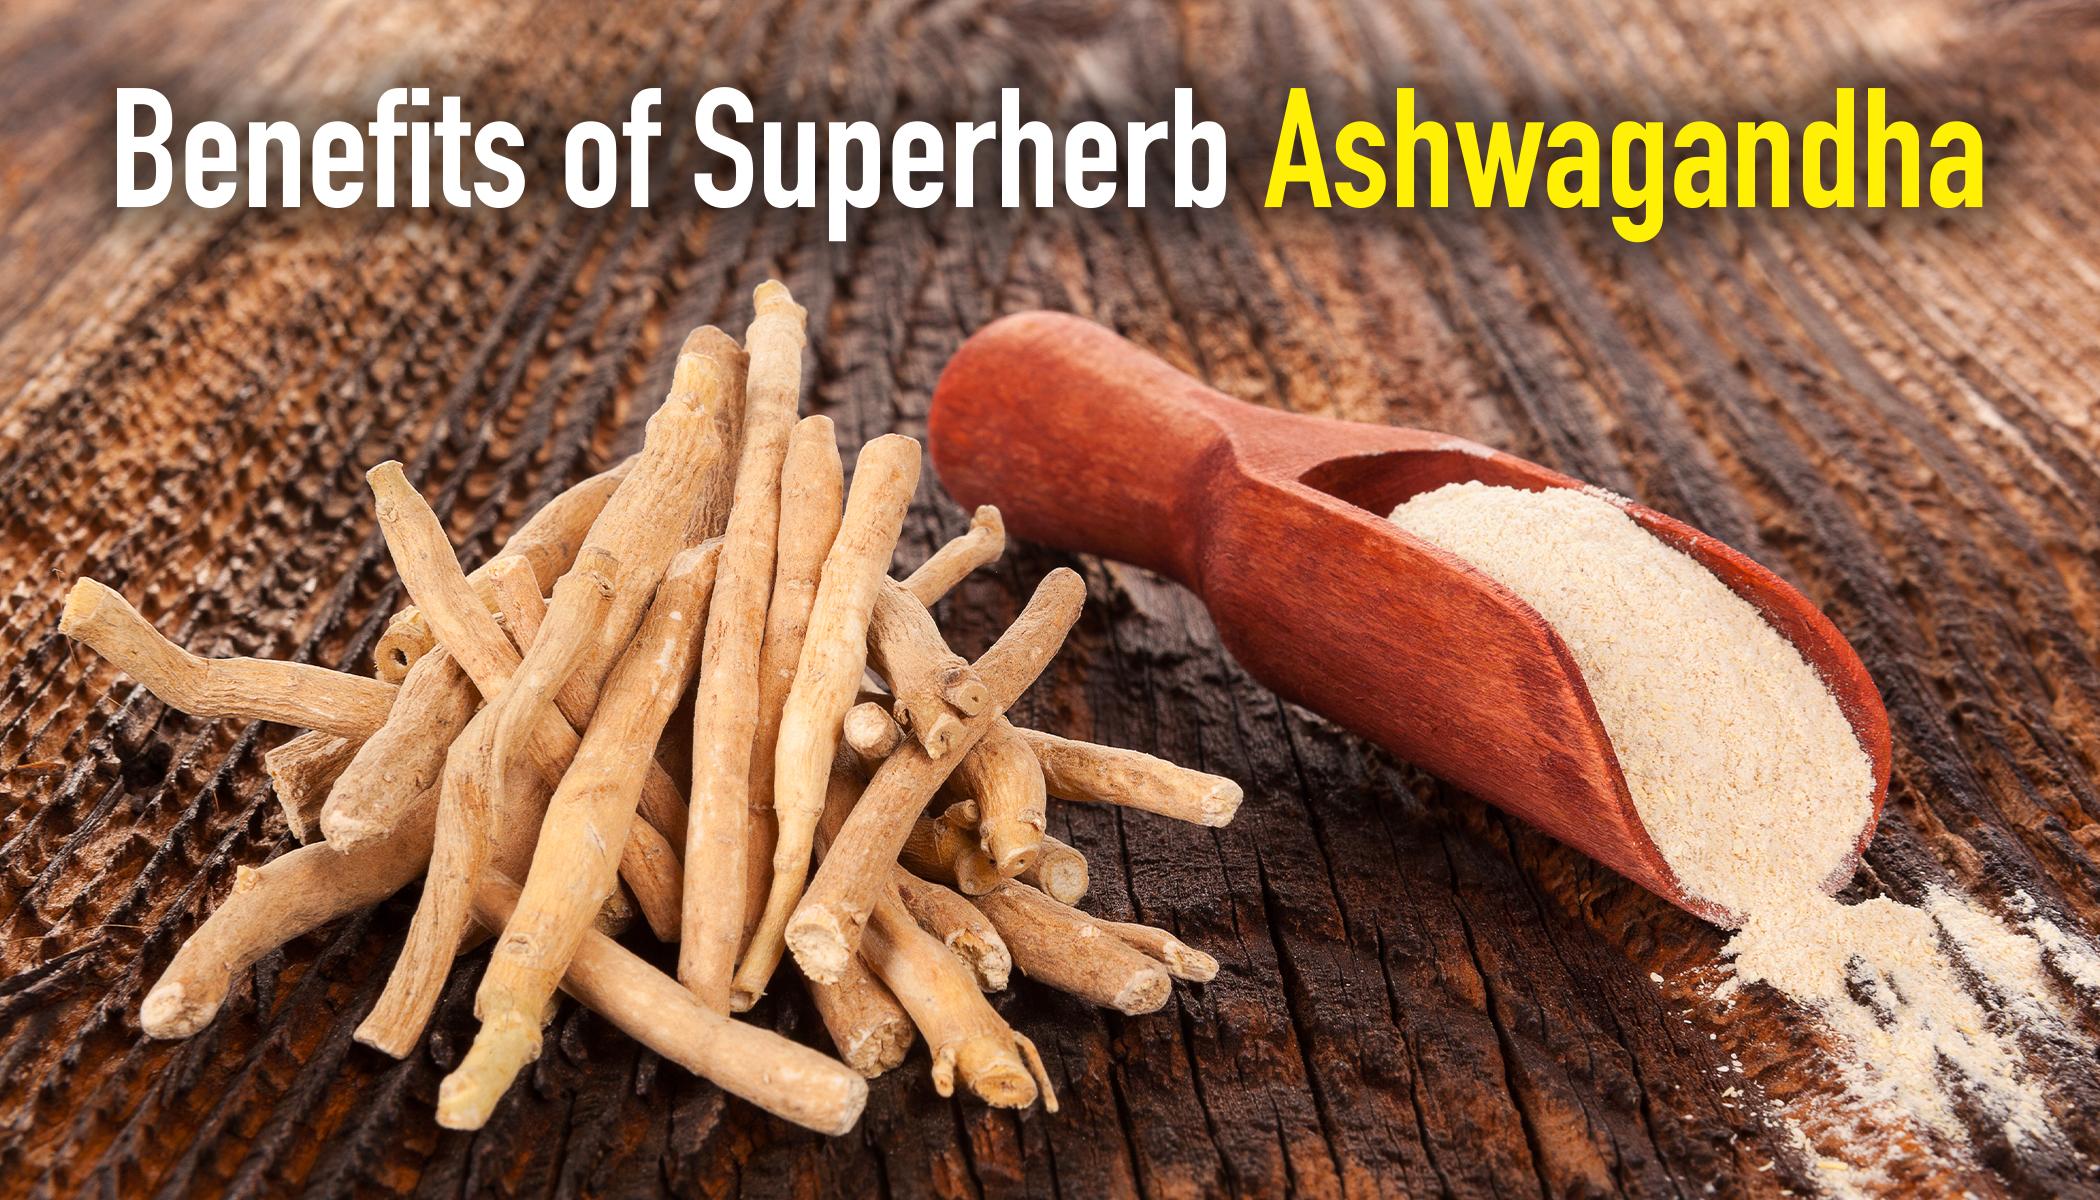 Ashwagandha: The Ancient Superherb That Lowers Cholesterol and Kills Tumor Cells